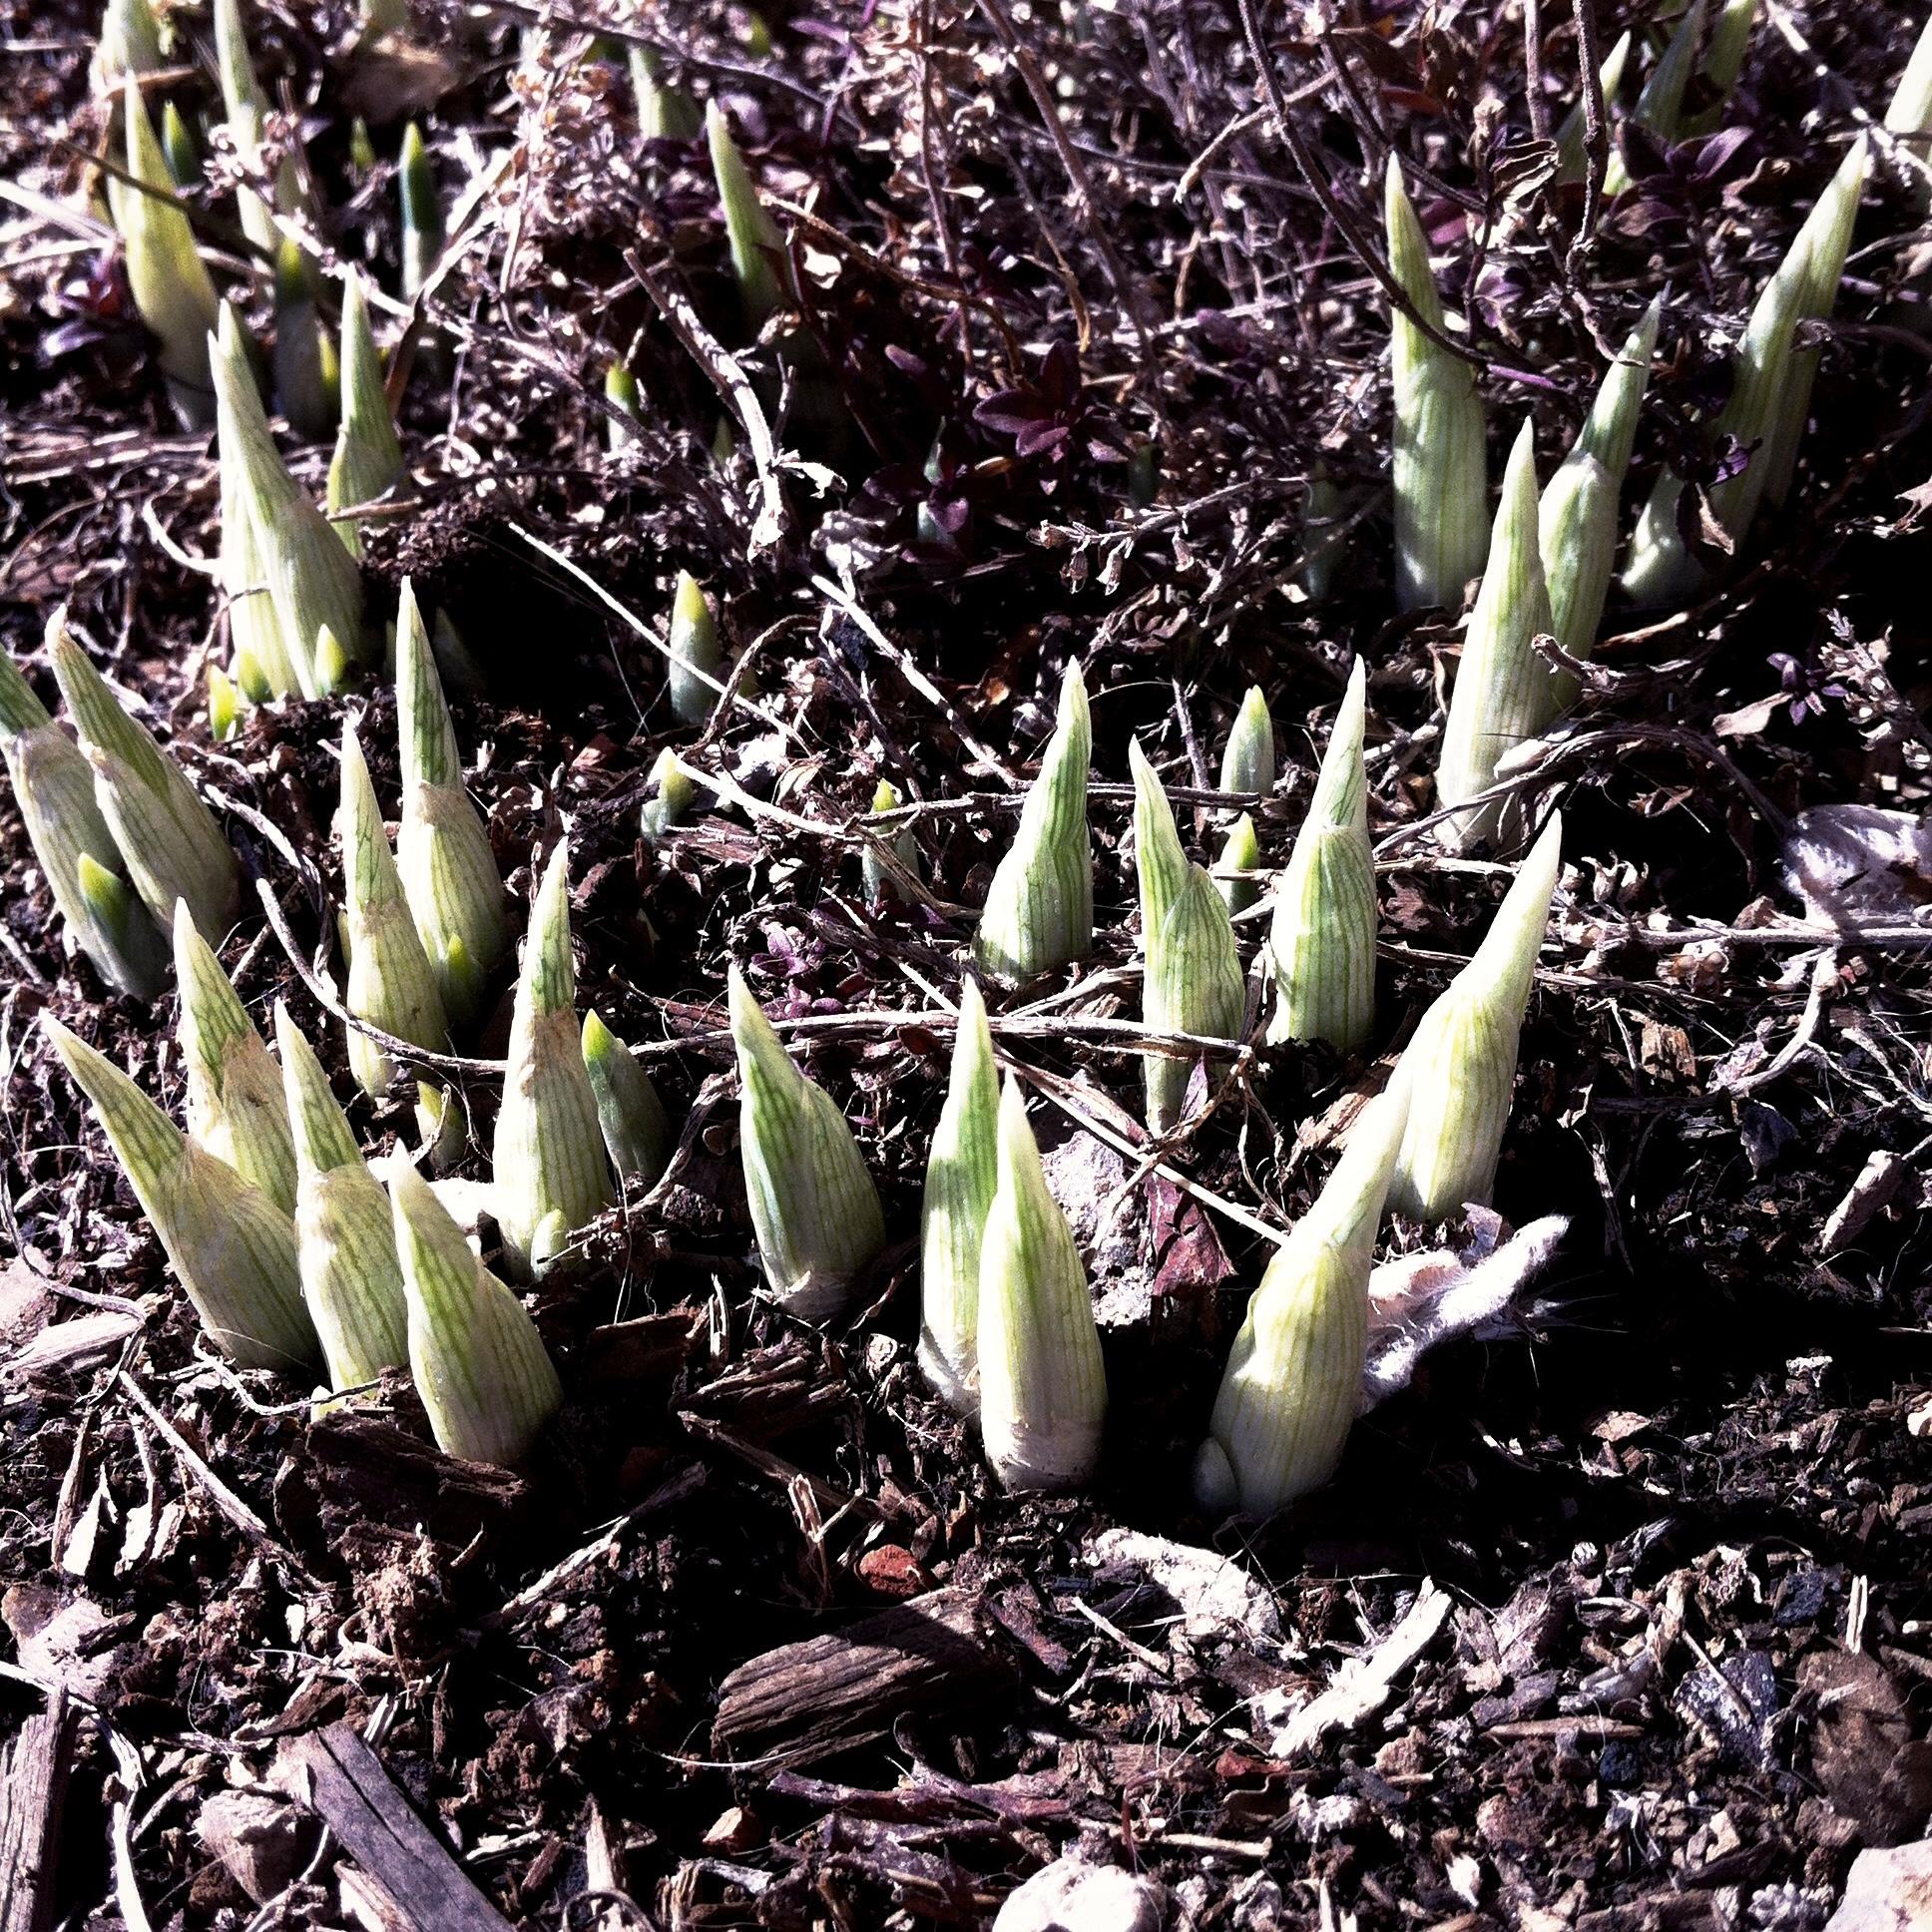 Miniature daffodil poking up despite last night's frigid temperature.